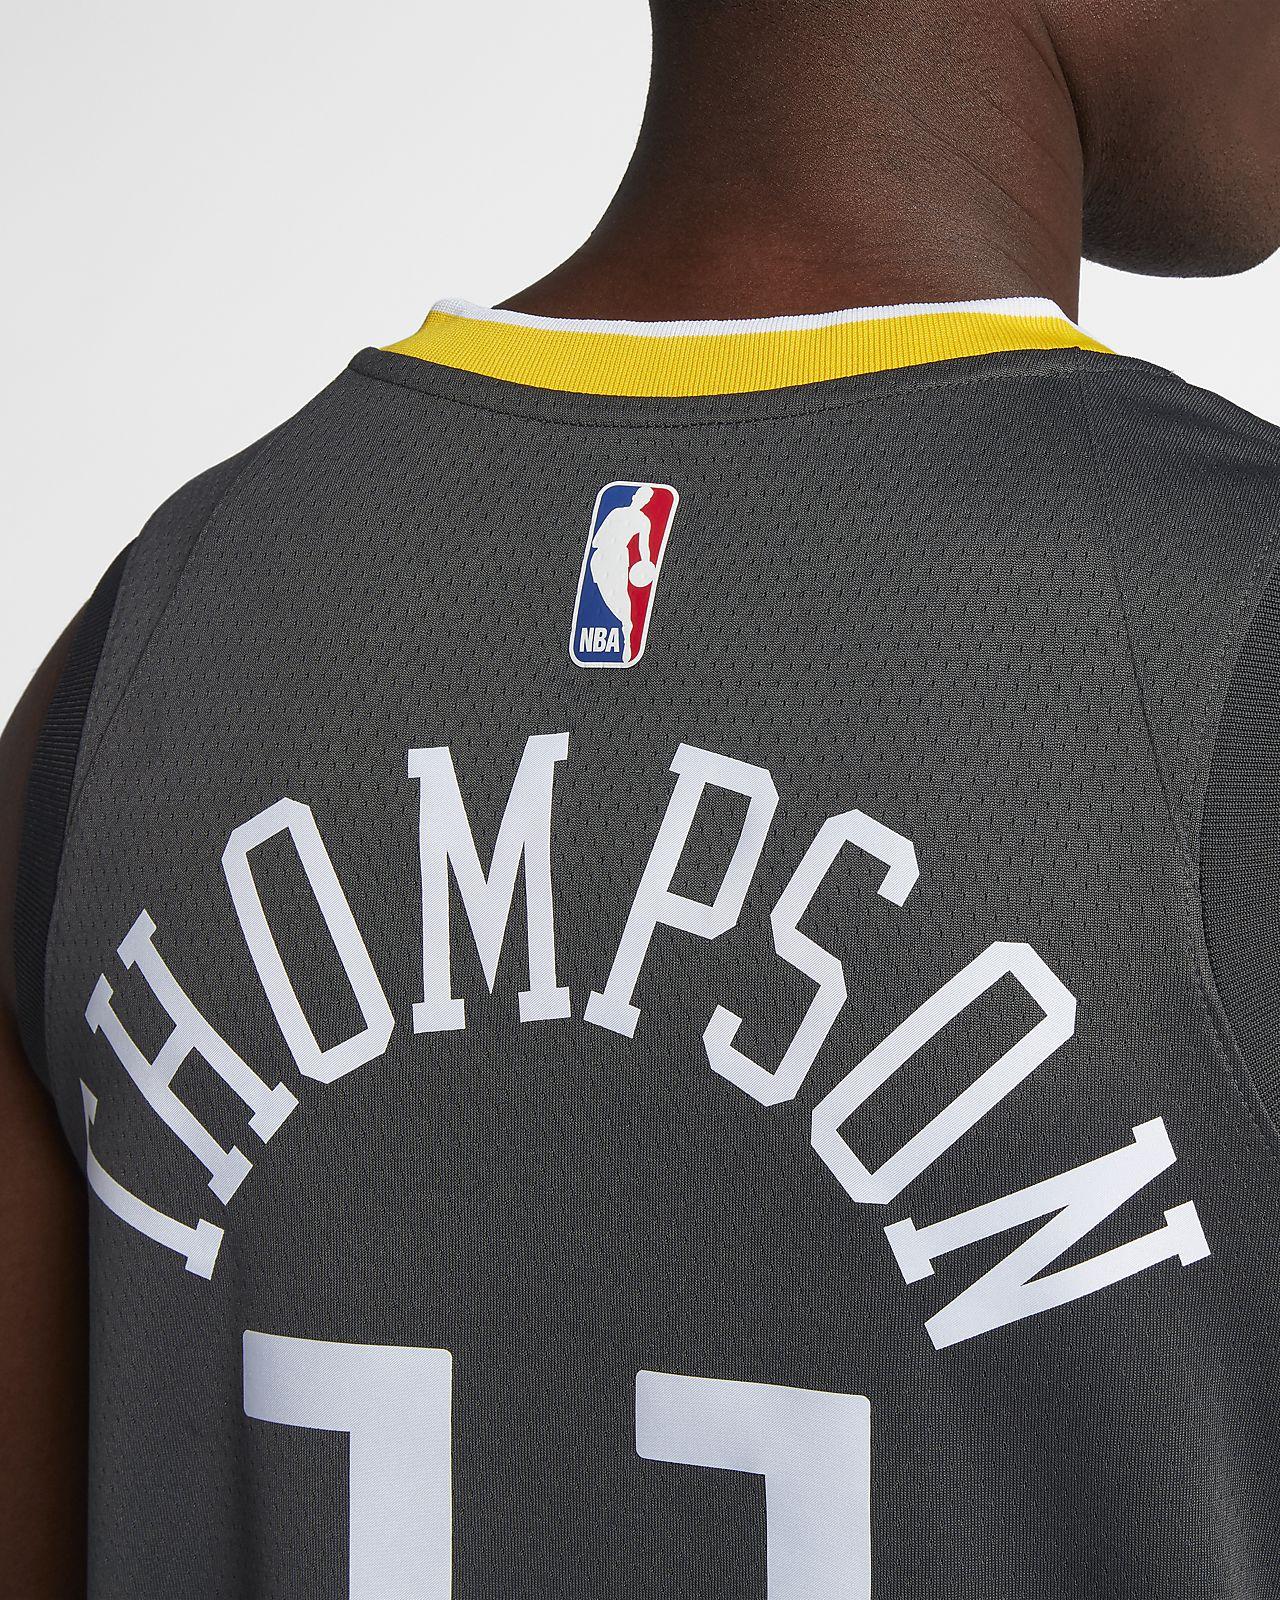 55888f664bb9 ... Klay Thompson Statement Edition Swingman (Golden State Warriors) Men s  Nike NBA Connected Jersey